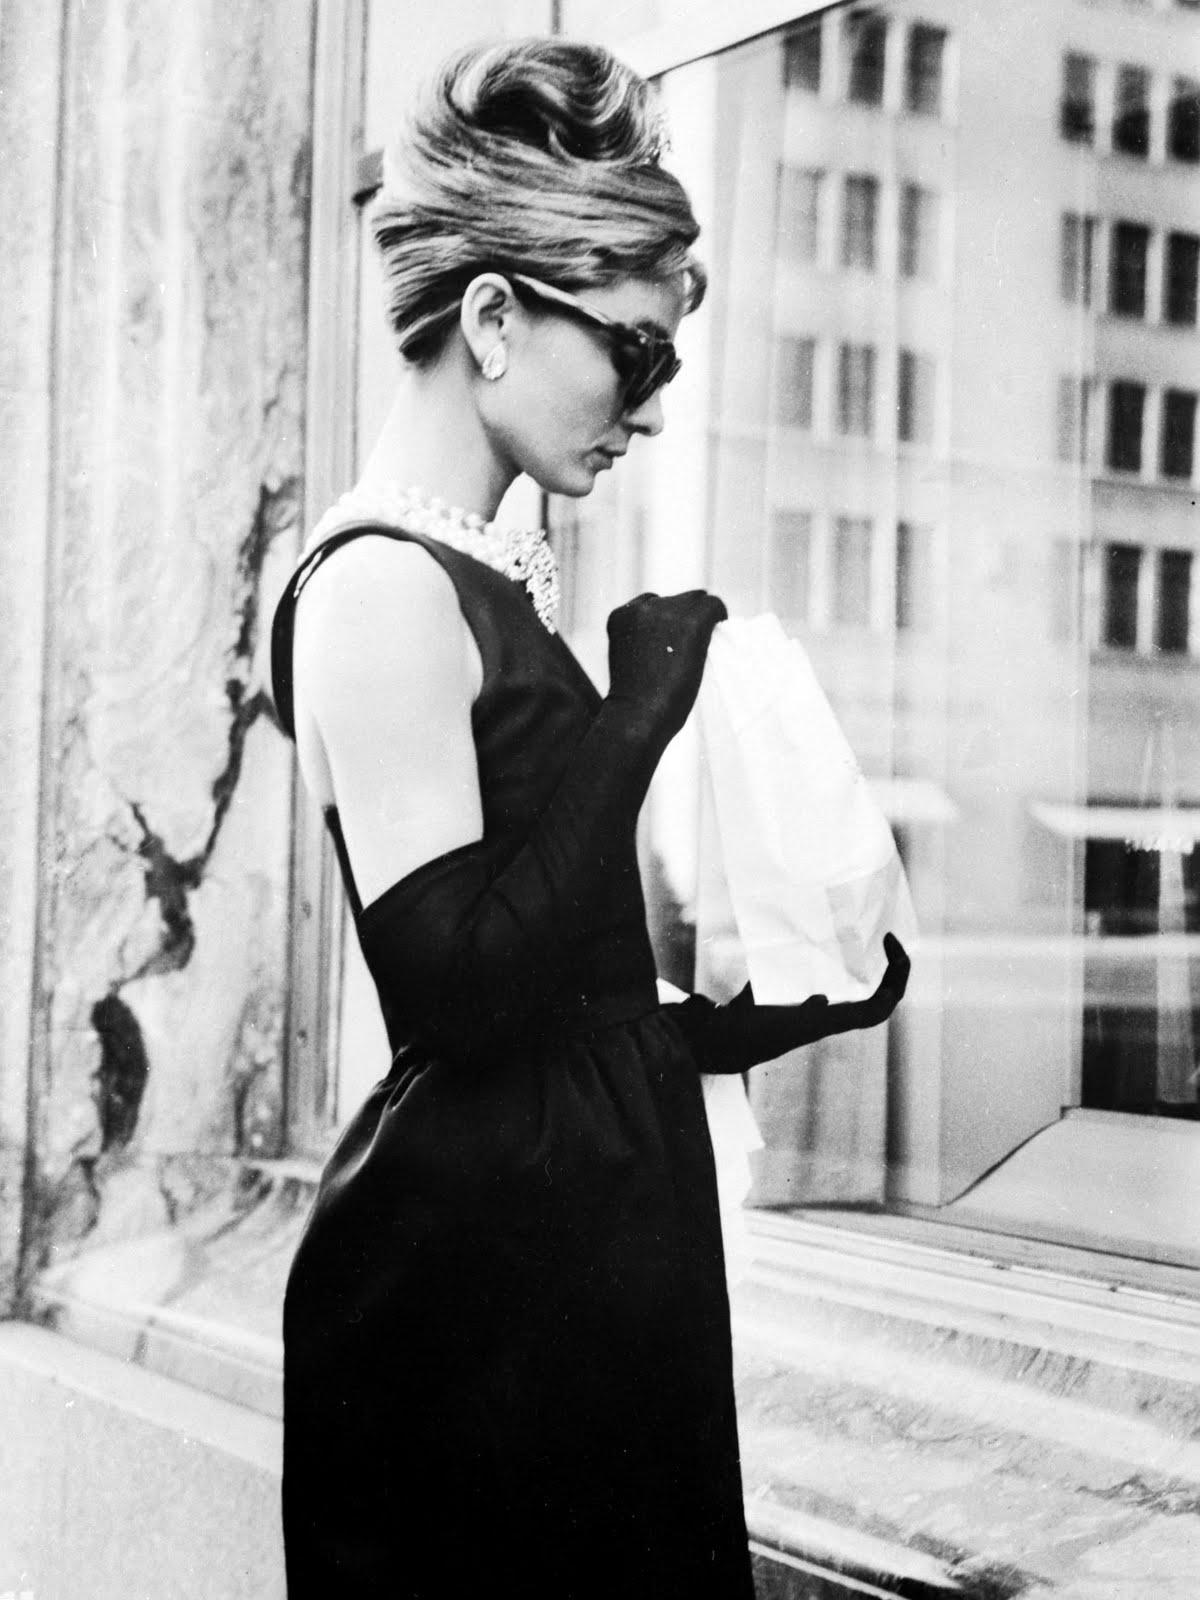 Breakfast At Tiffany's | The Fabulous Audrey Hepburn